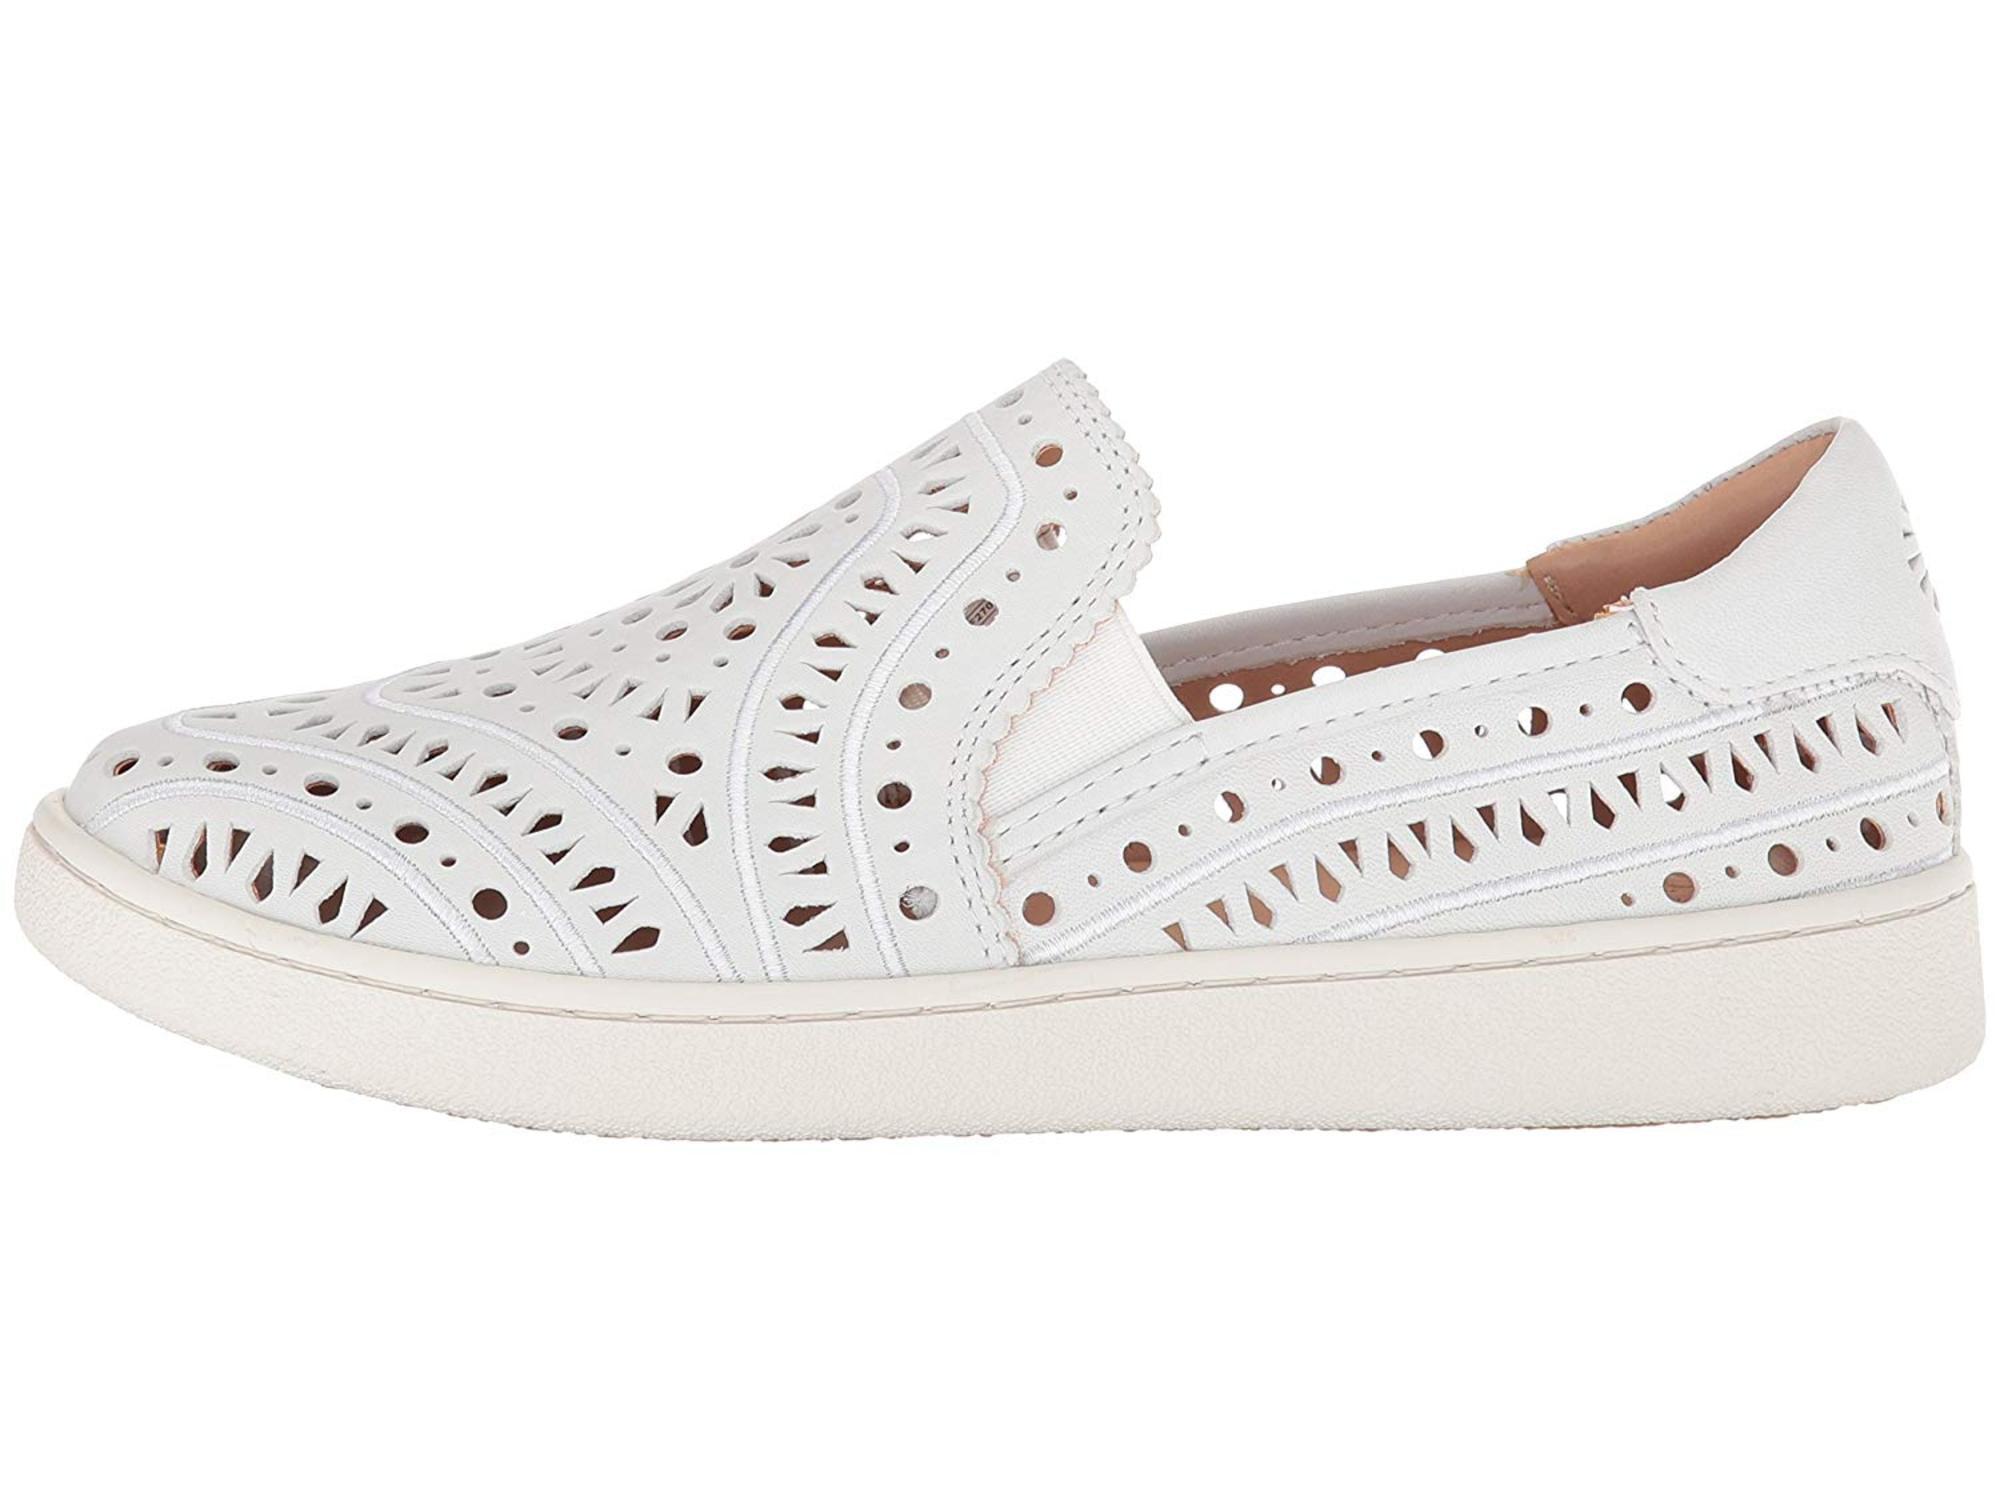 UGG Australia Women's Cas Perf Sneaker